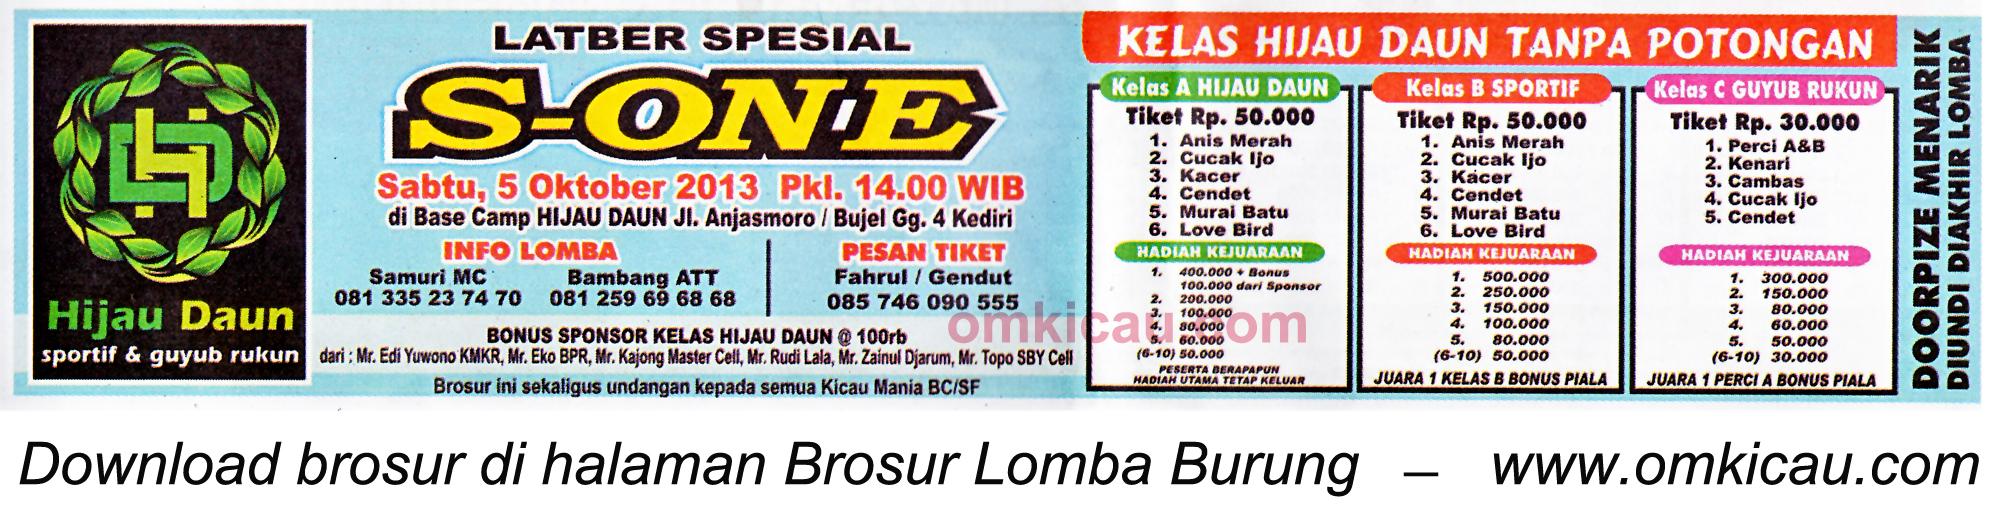 Brosur Latber Spesial S-One, Kediri, 5 Oktober 2013